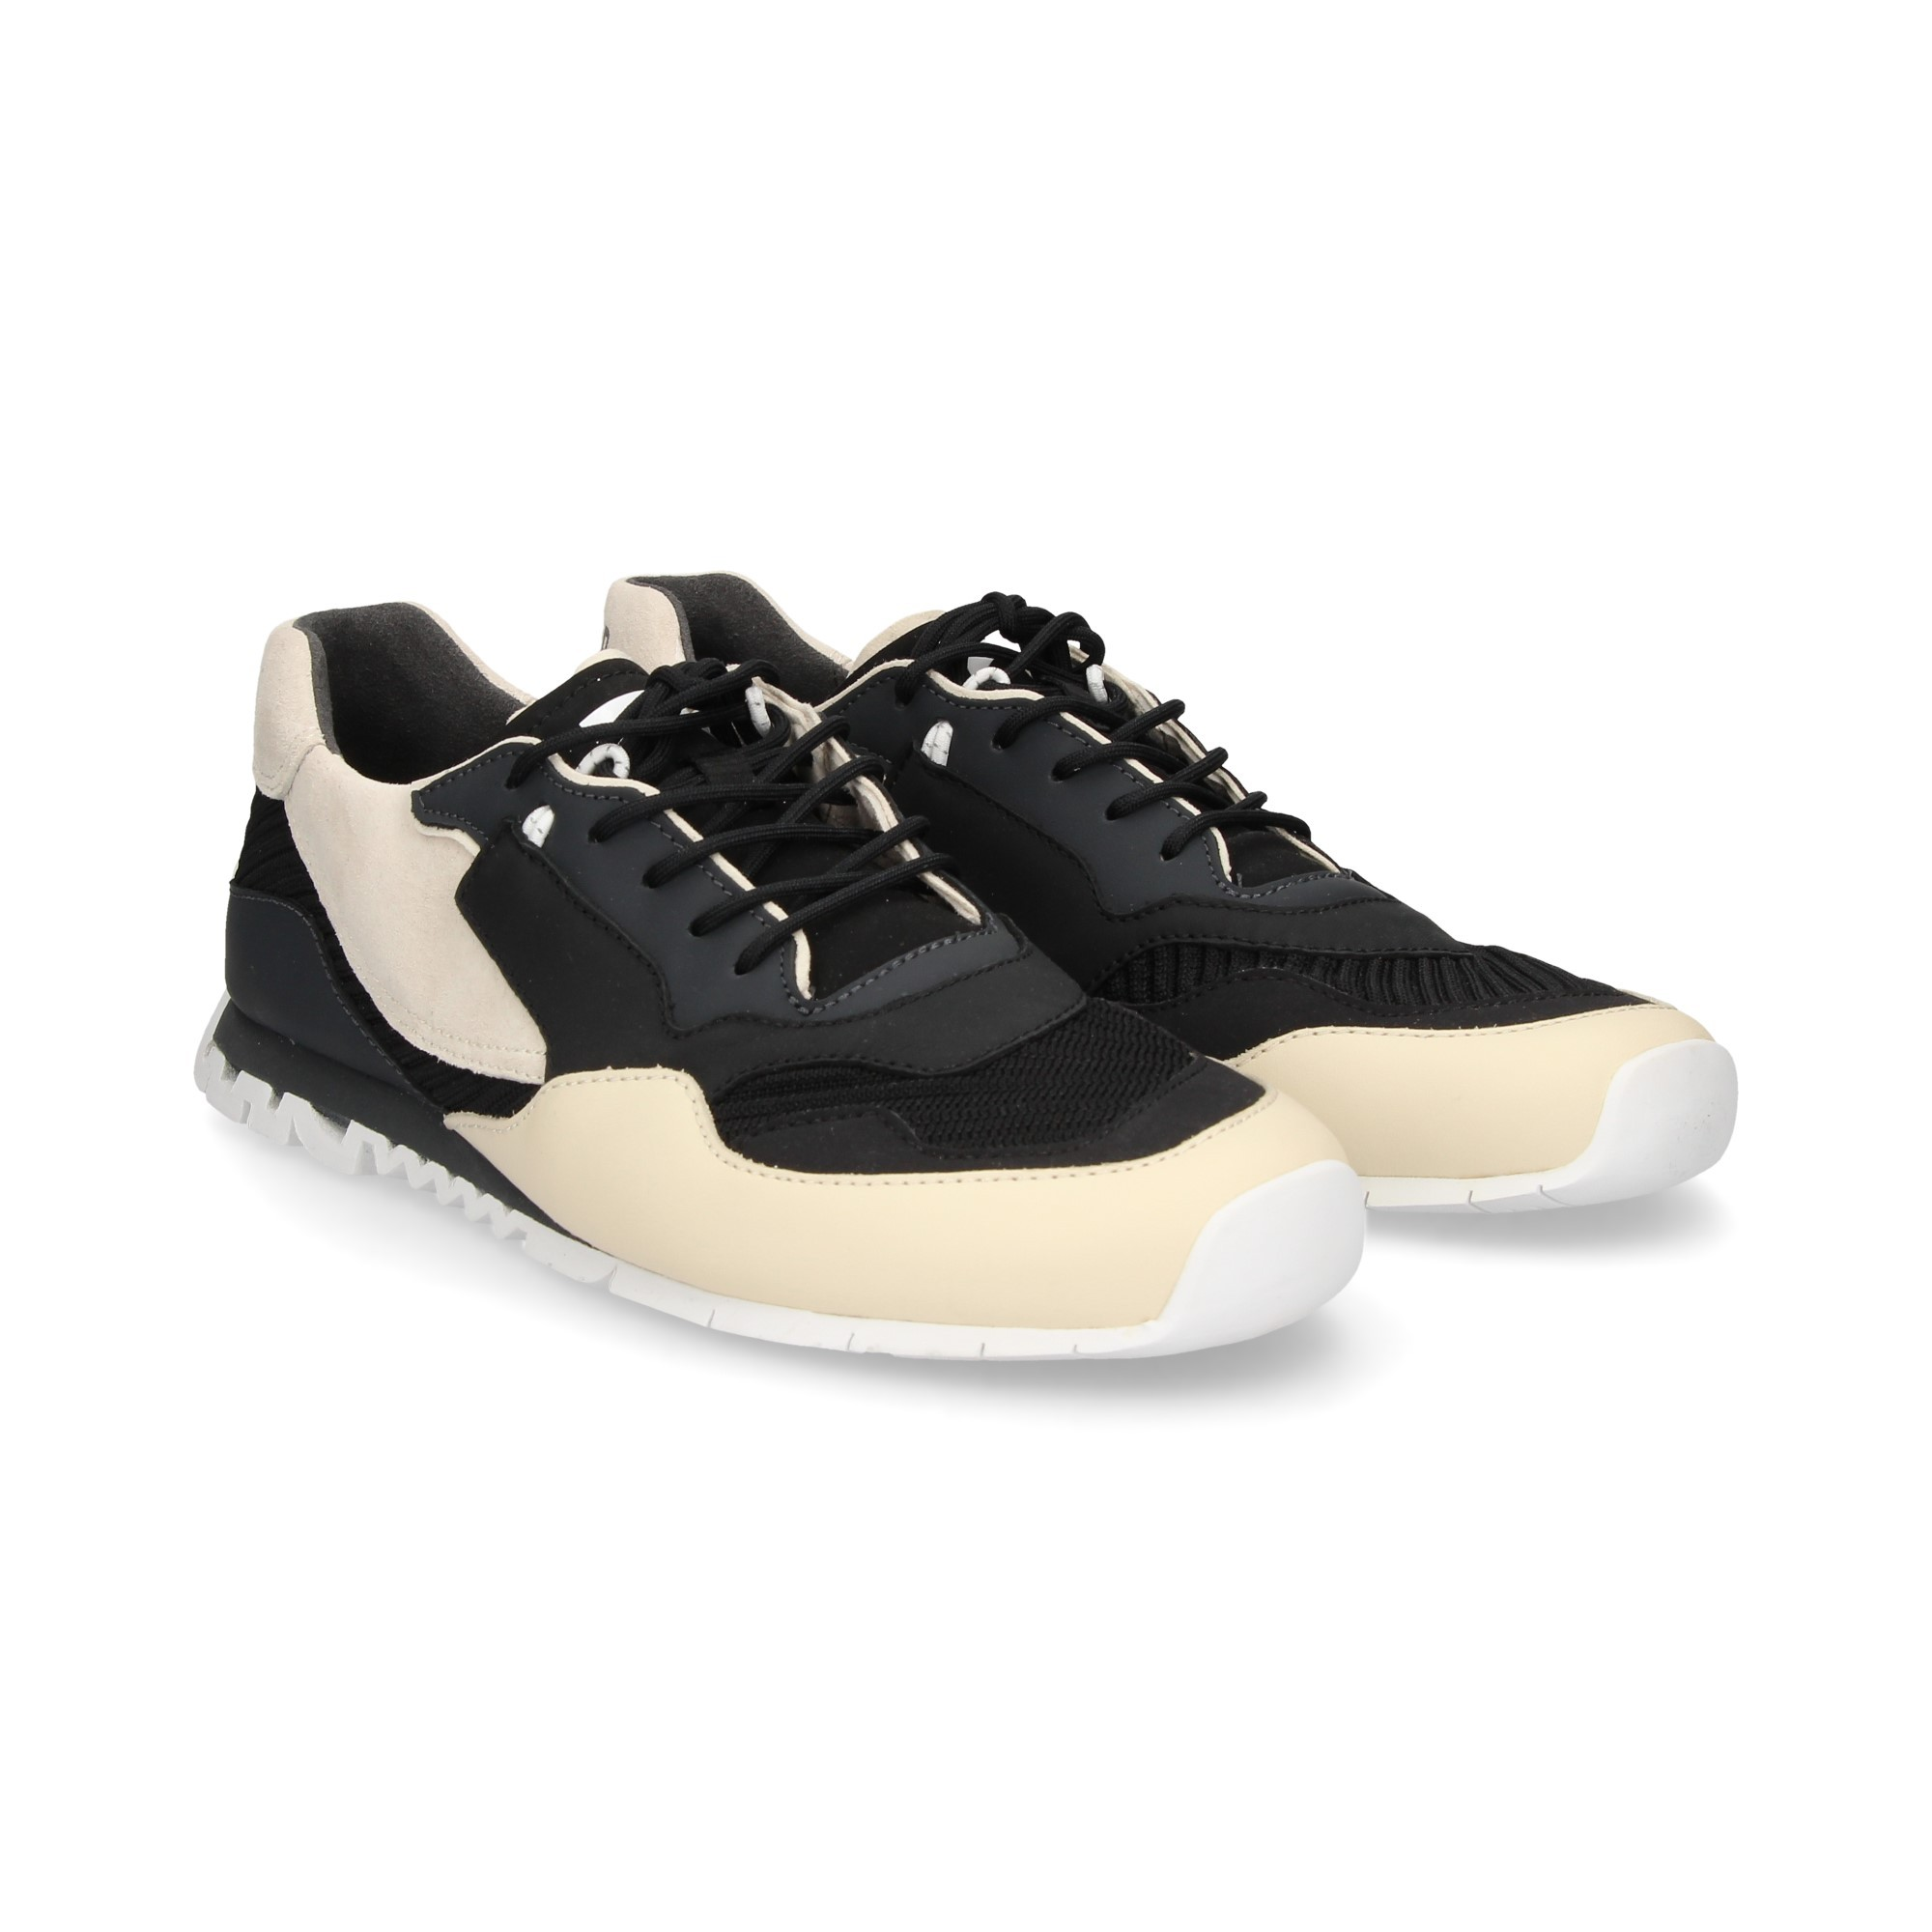 9483c9593c3 CAMPER Men s sneakers K100436 007 MULTICOLOR